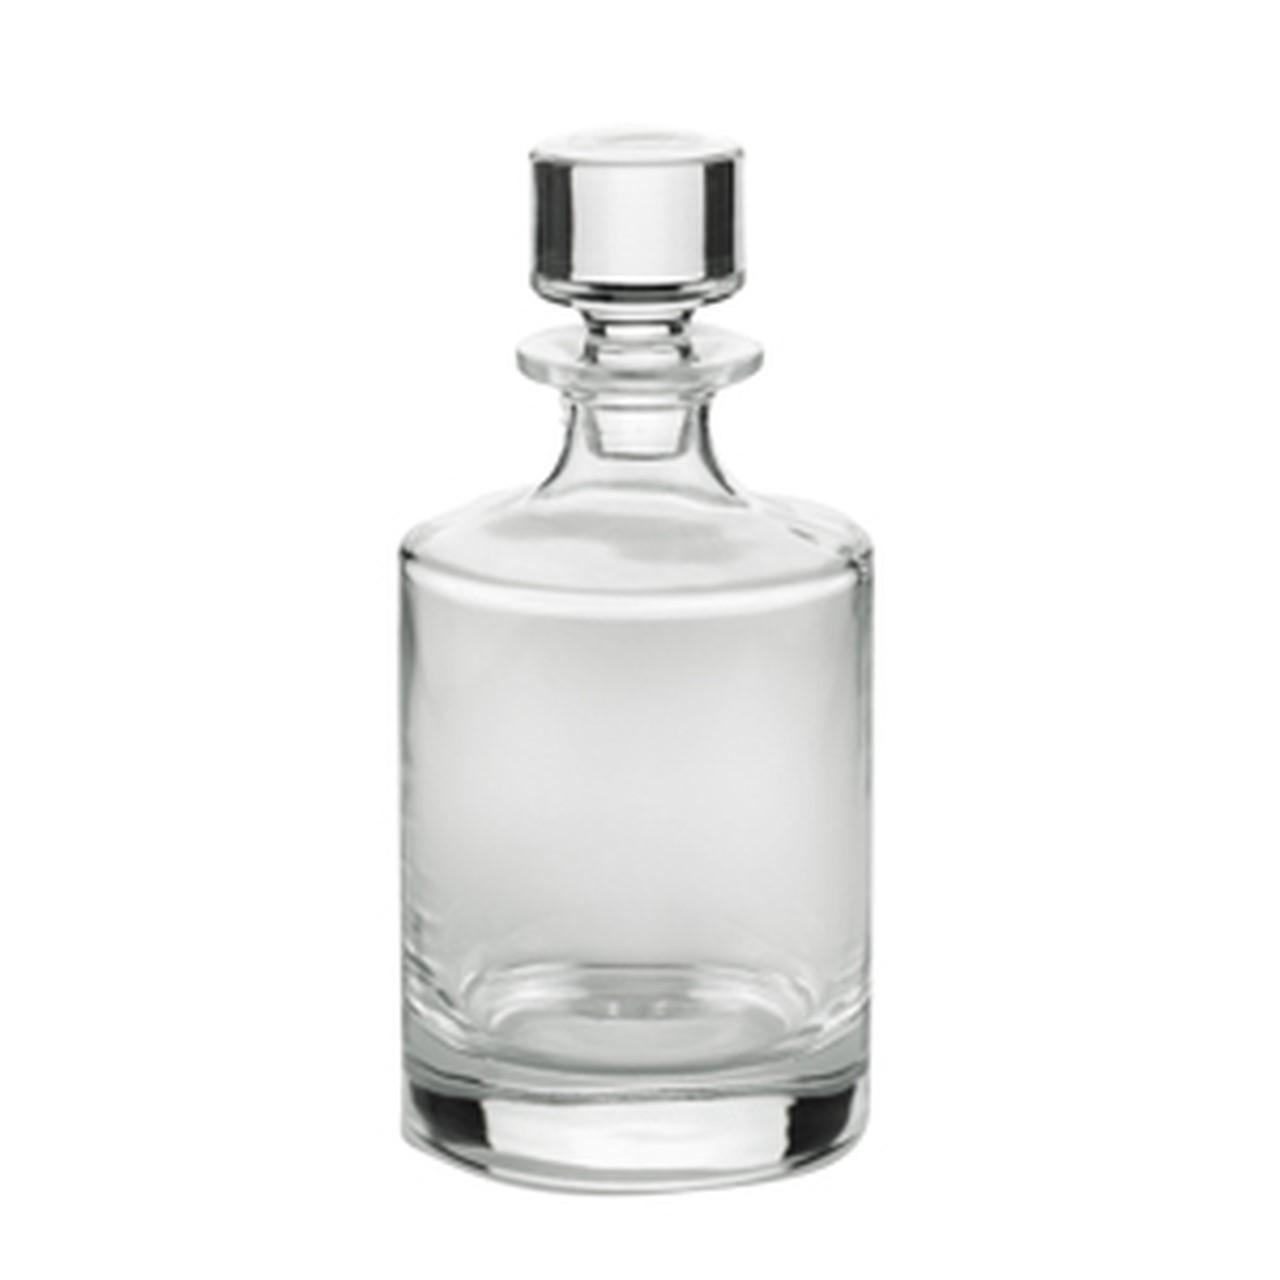 Garrafa Decanter 850ml para whisky de cristal Wolff - 27779